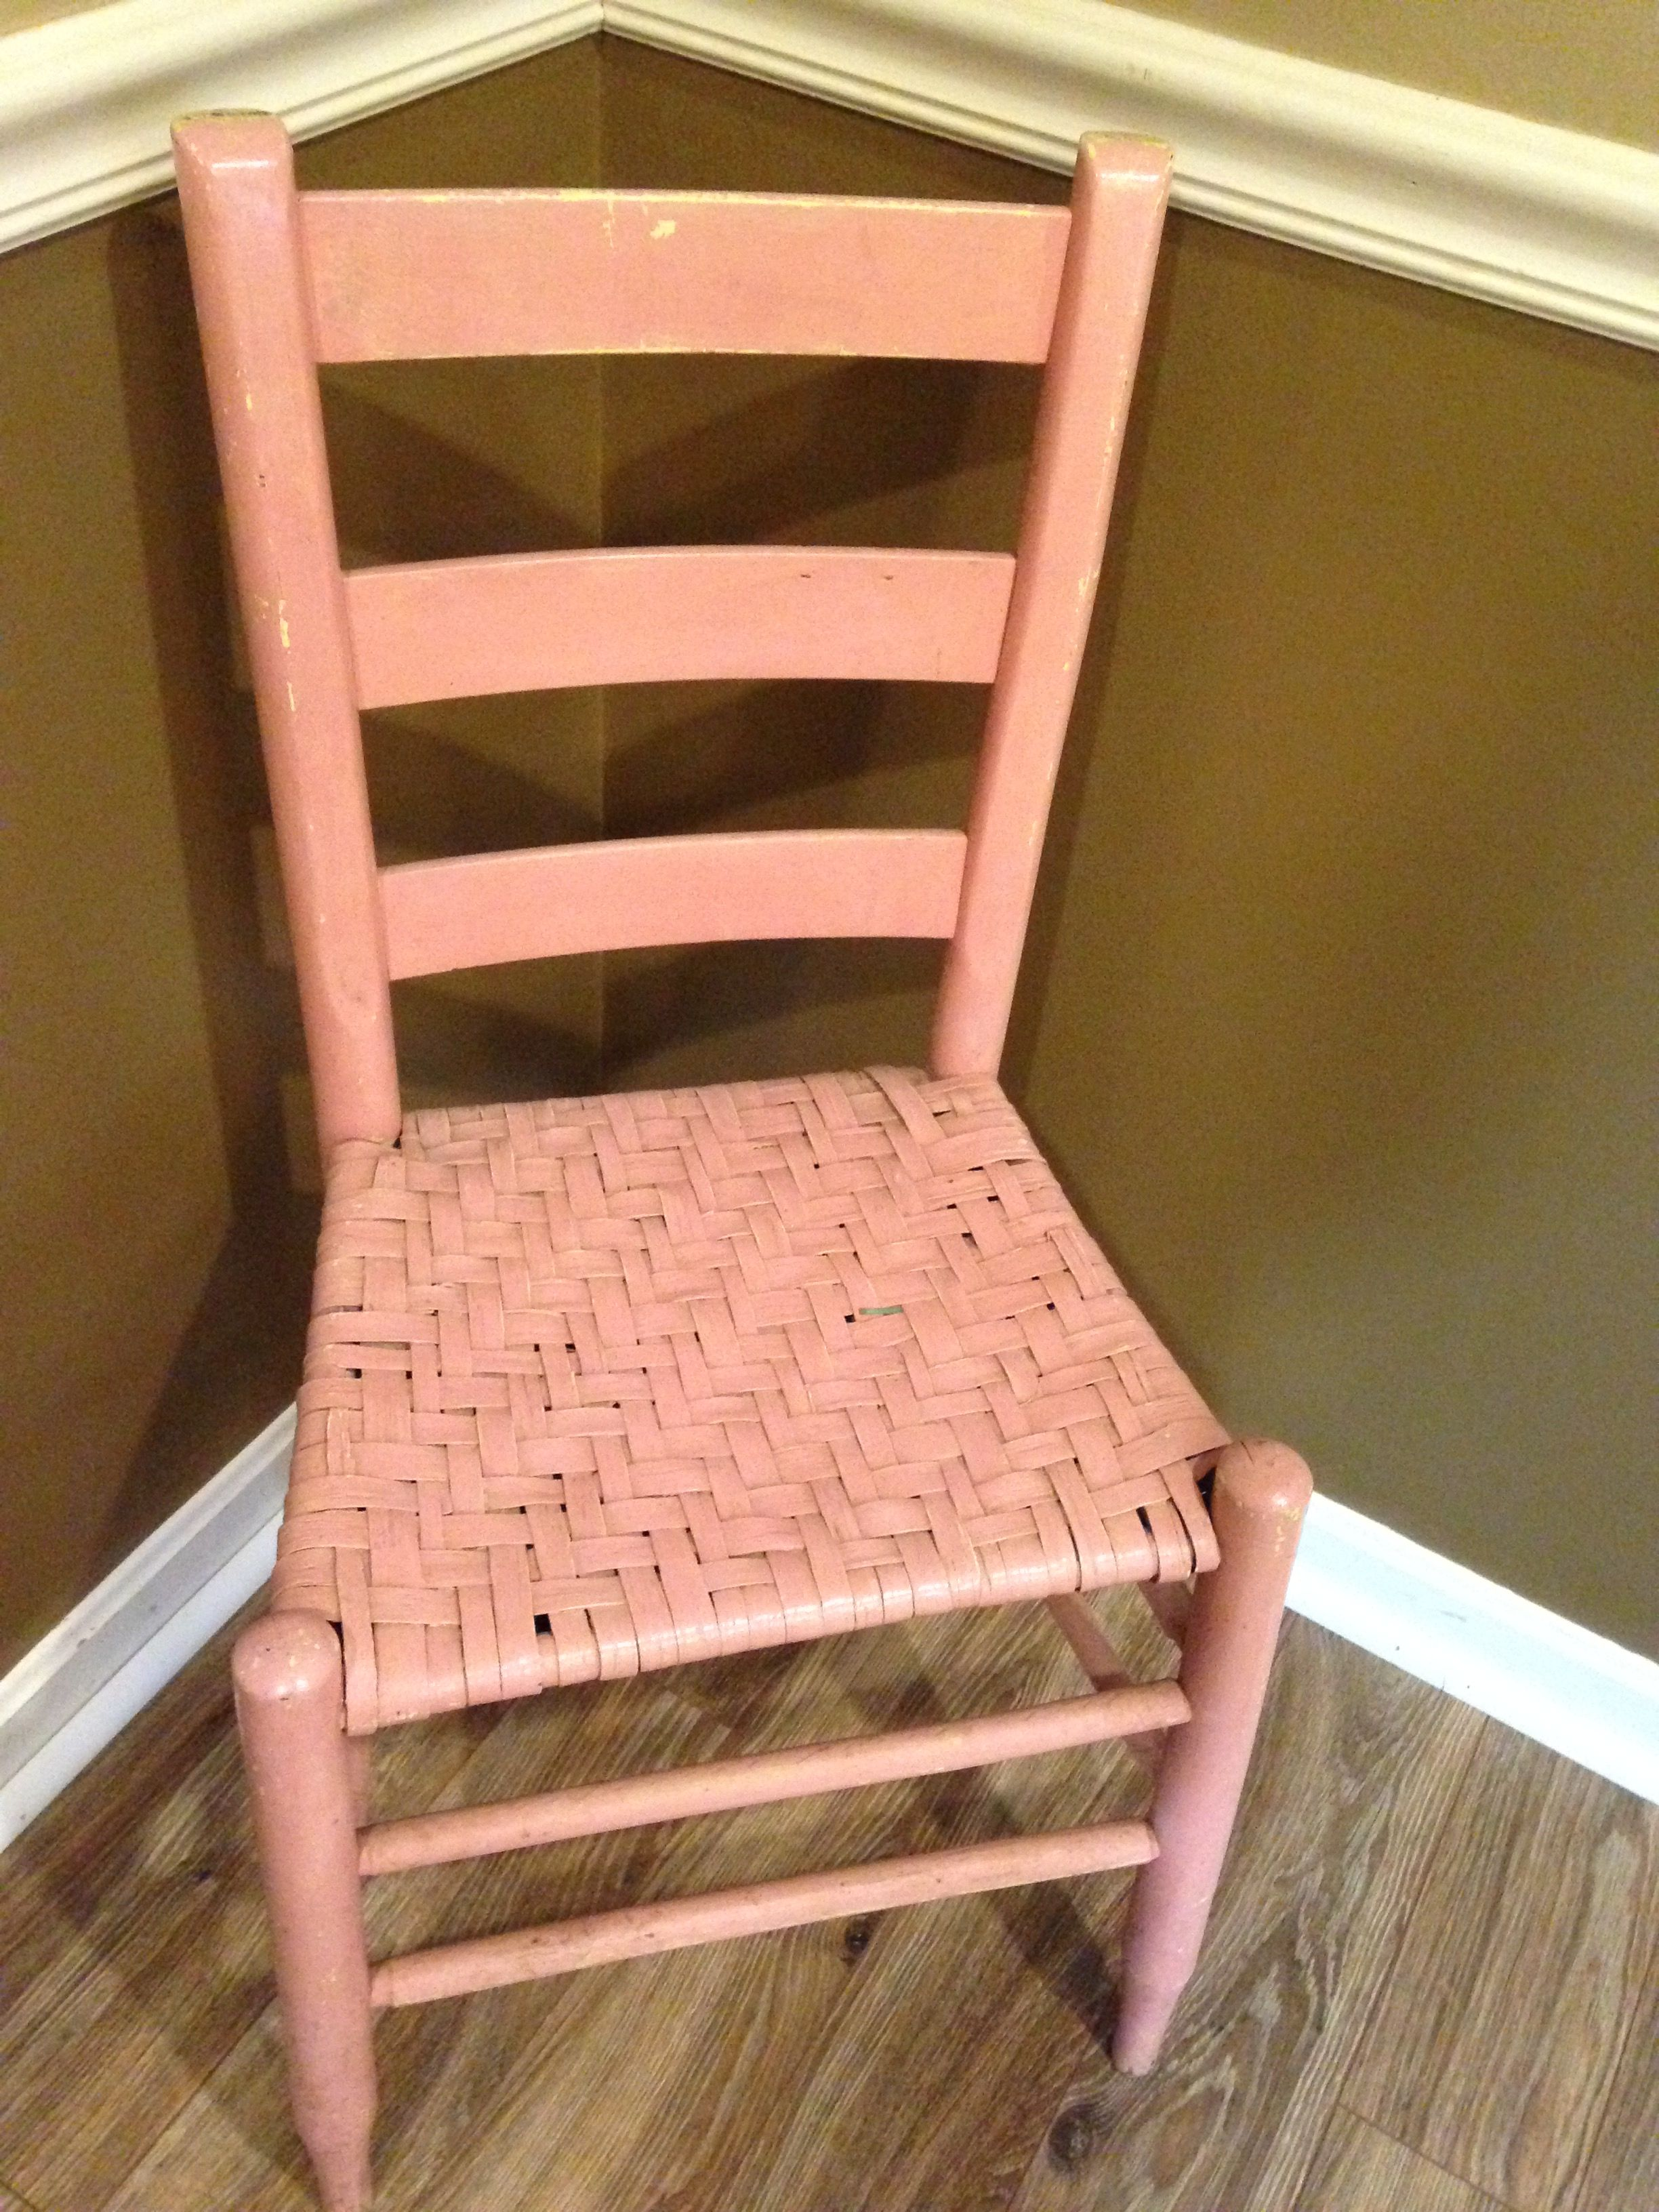 Starting antique child's chair